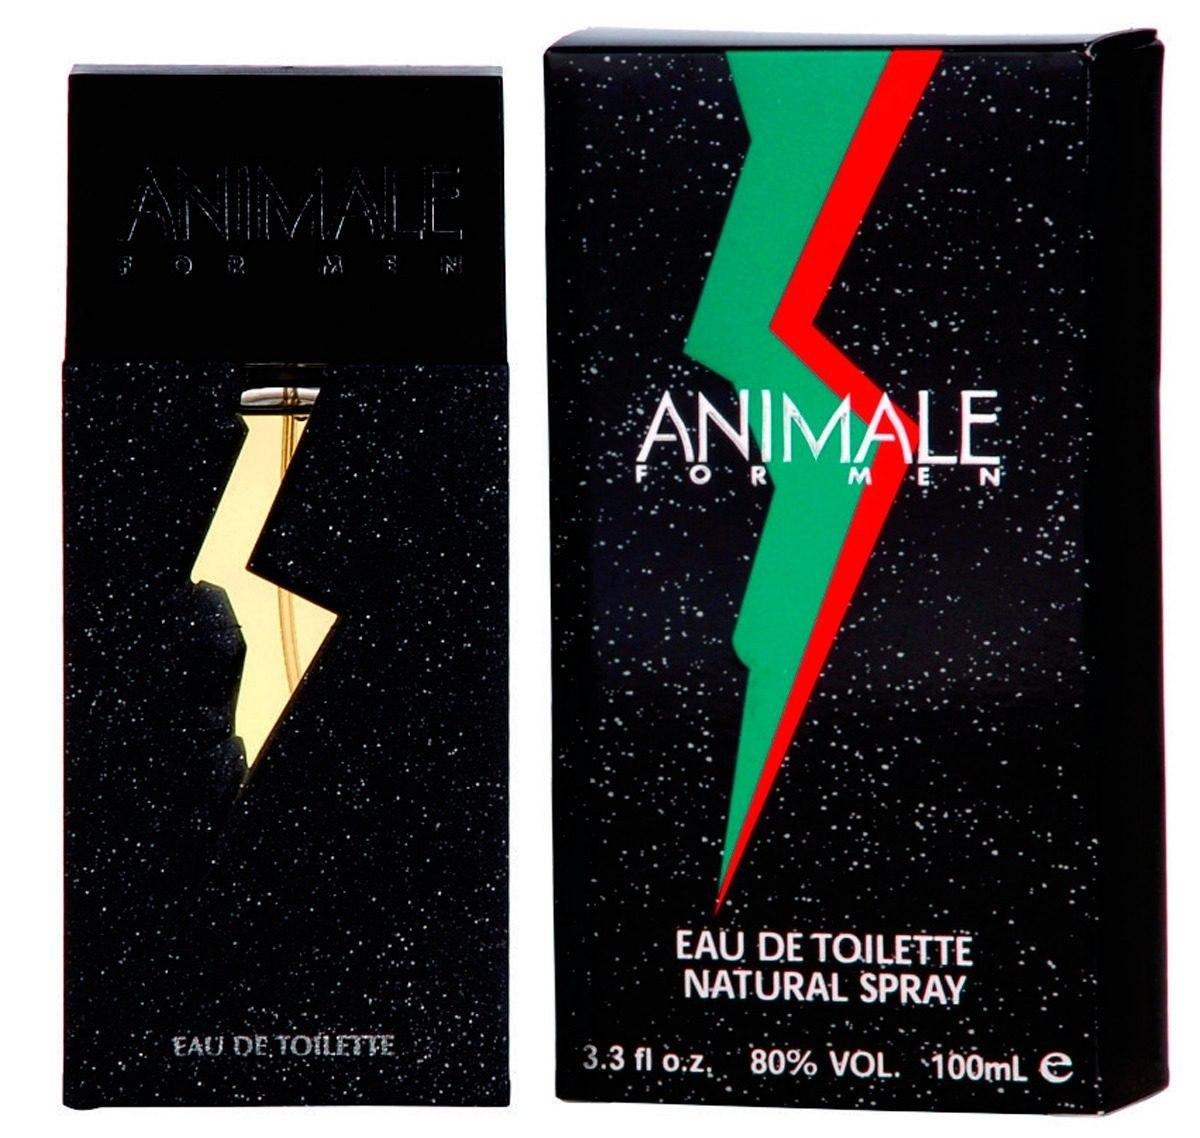 perfume-animale-100ml-100-original-e-lacrado-imperdivel-12319-MLB20057520501_032014-F__38750_zoom